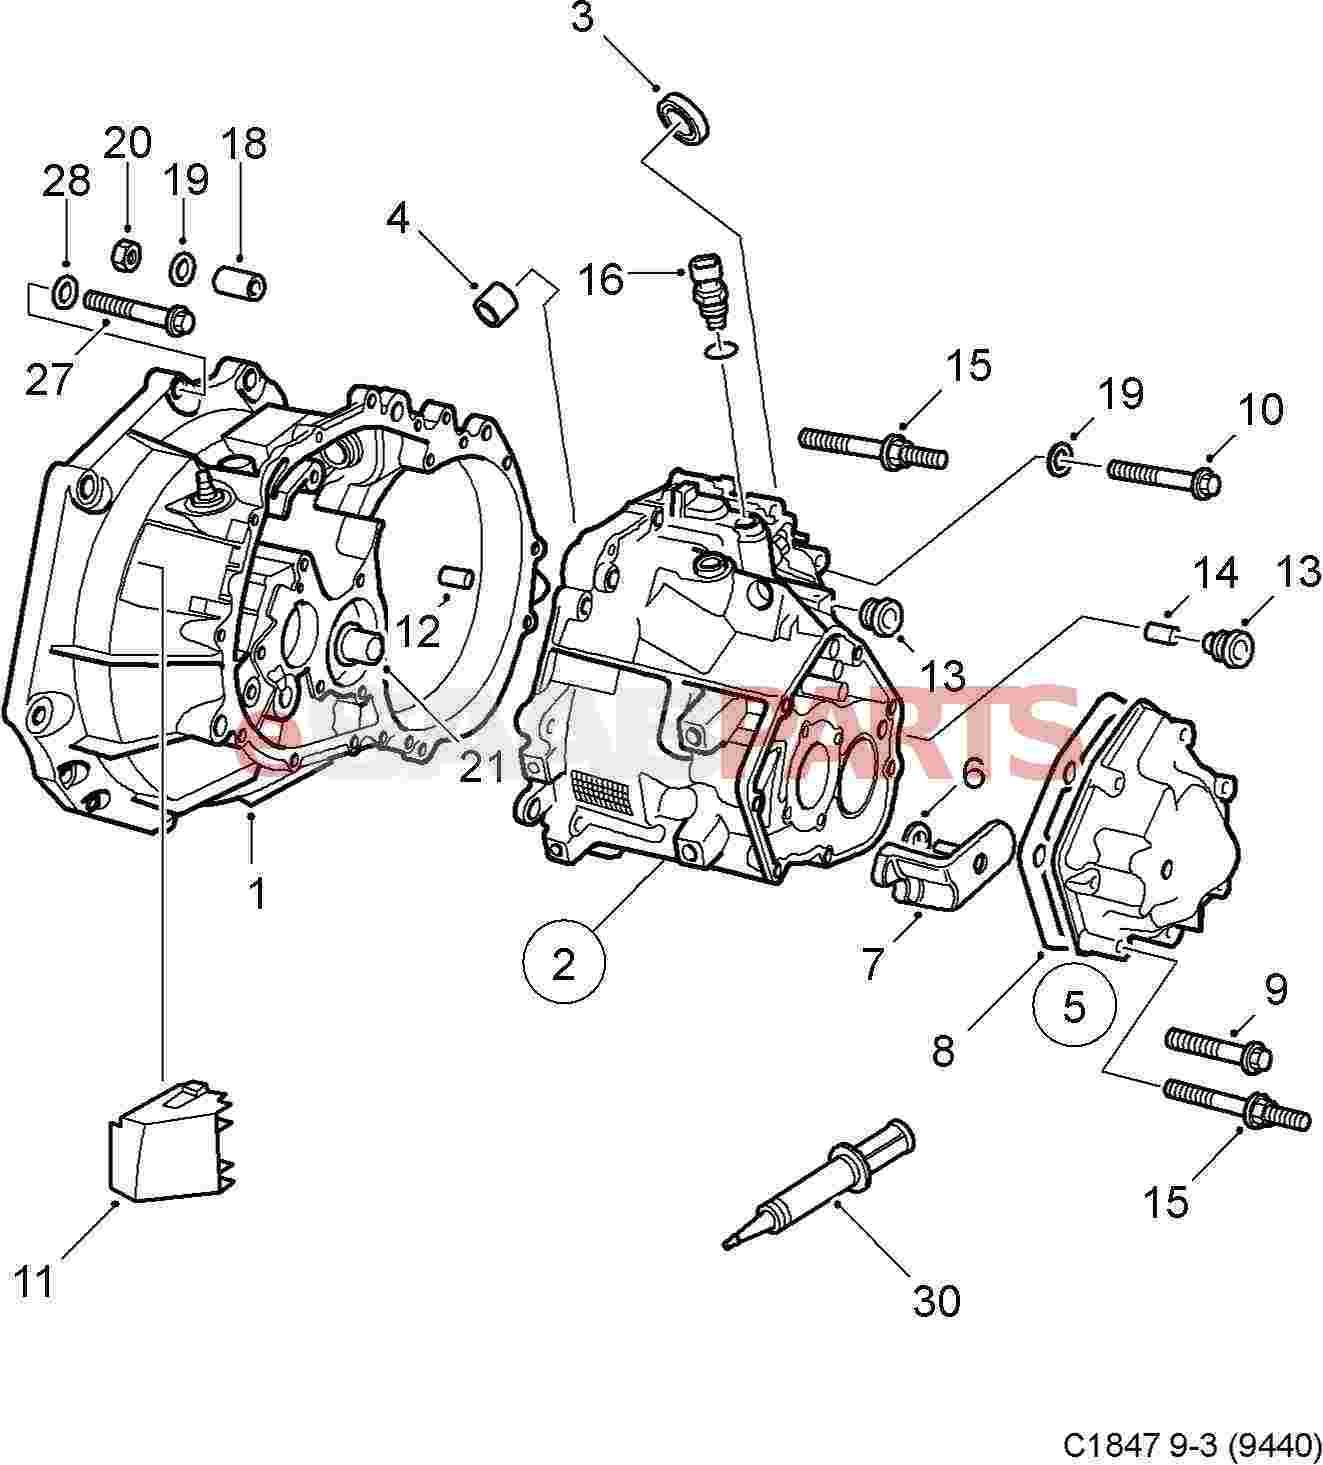 35 Manual Transmission Parts Diagram